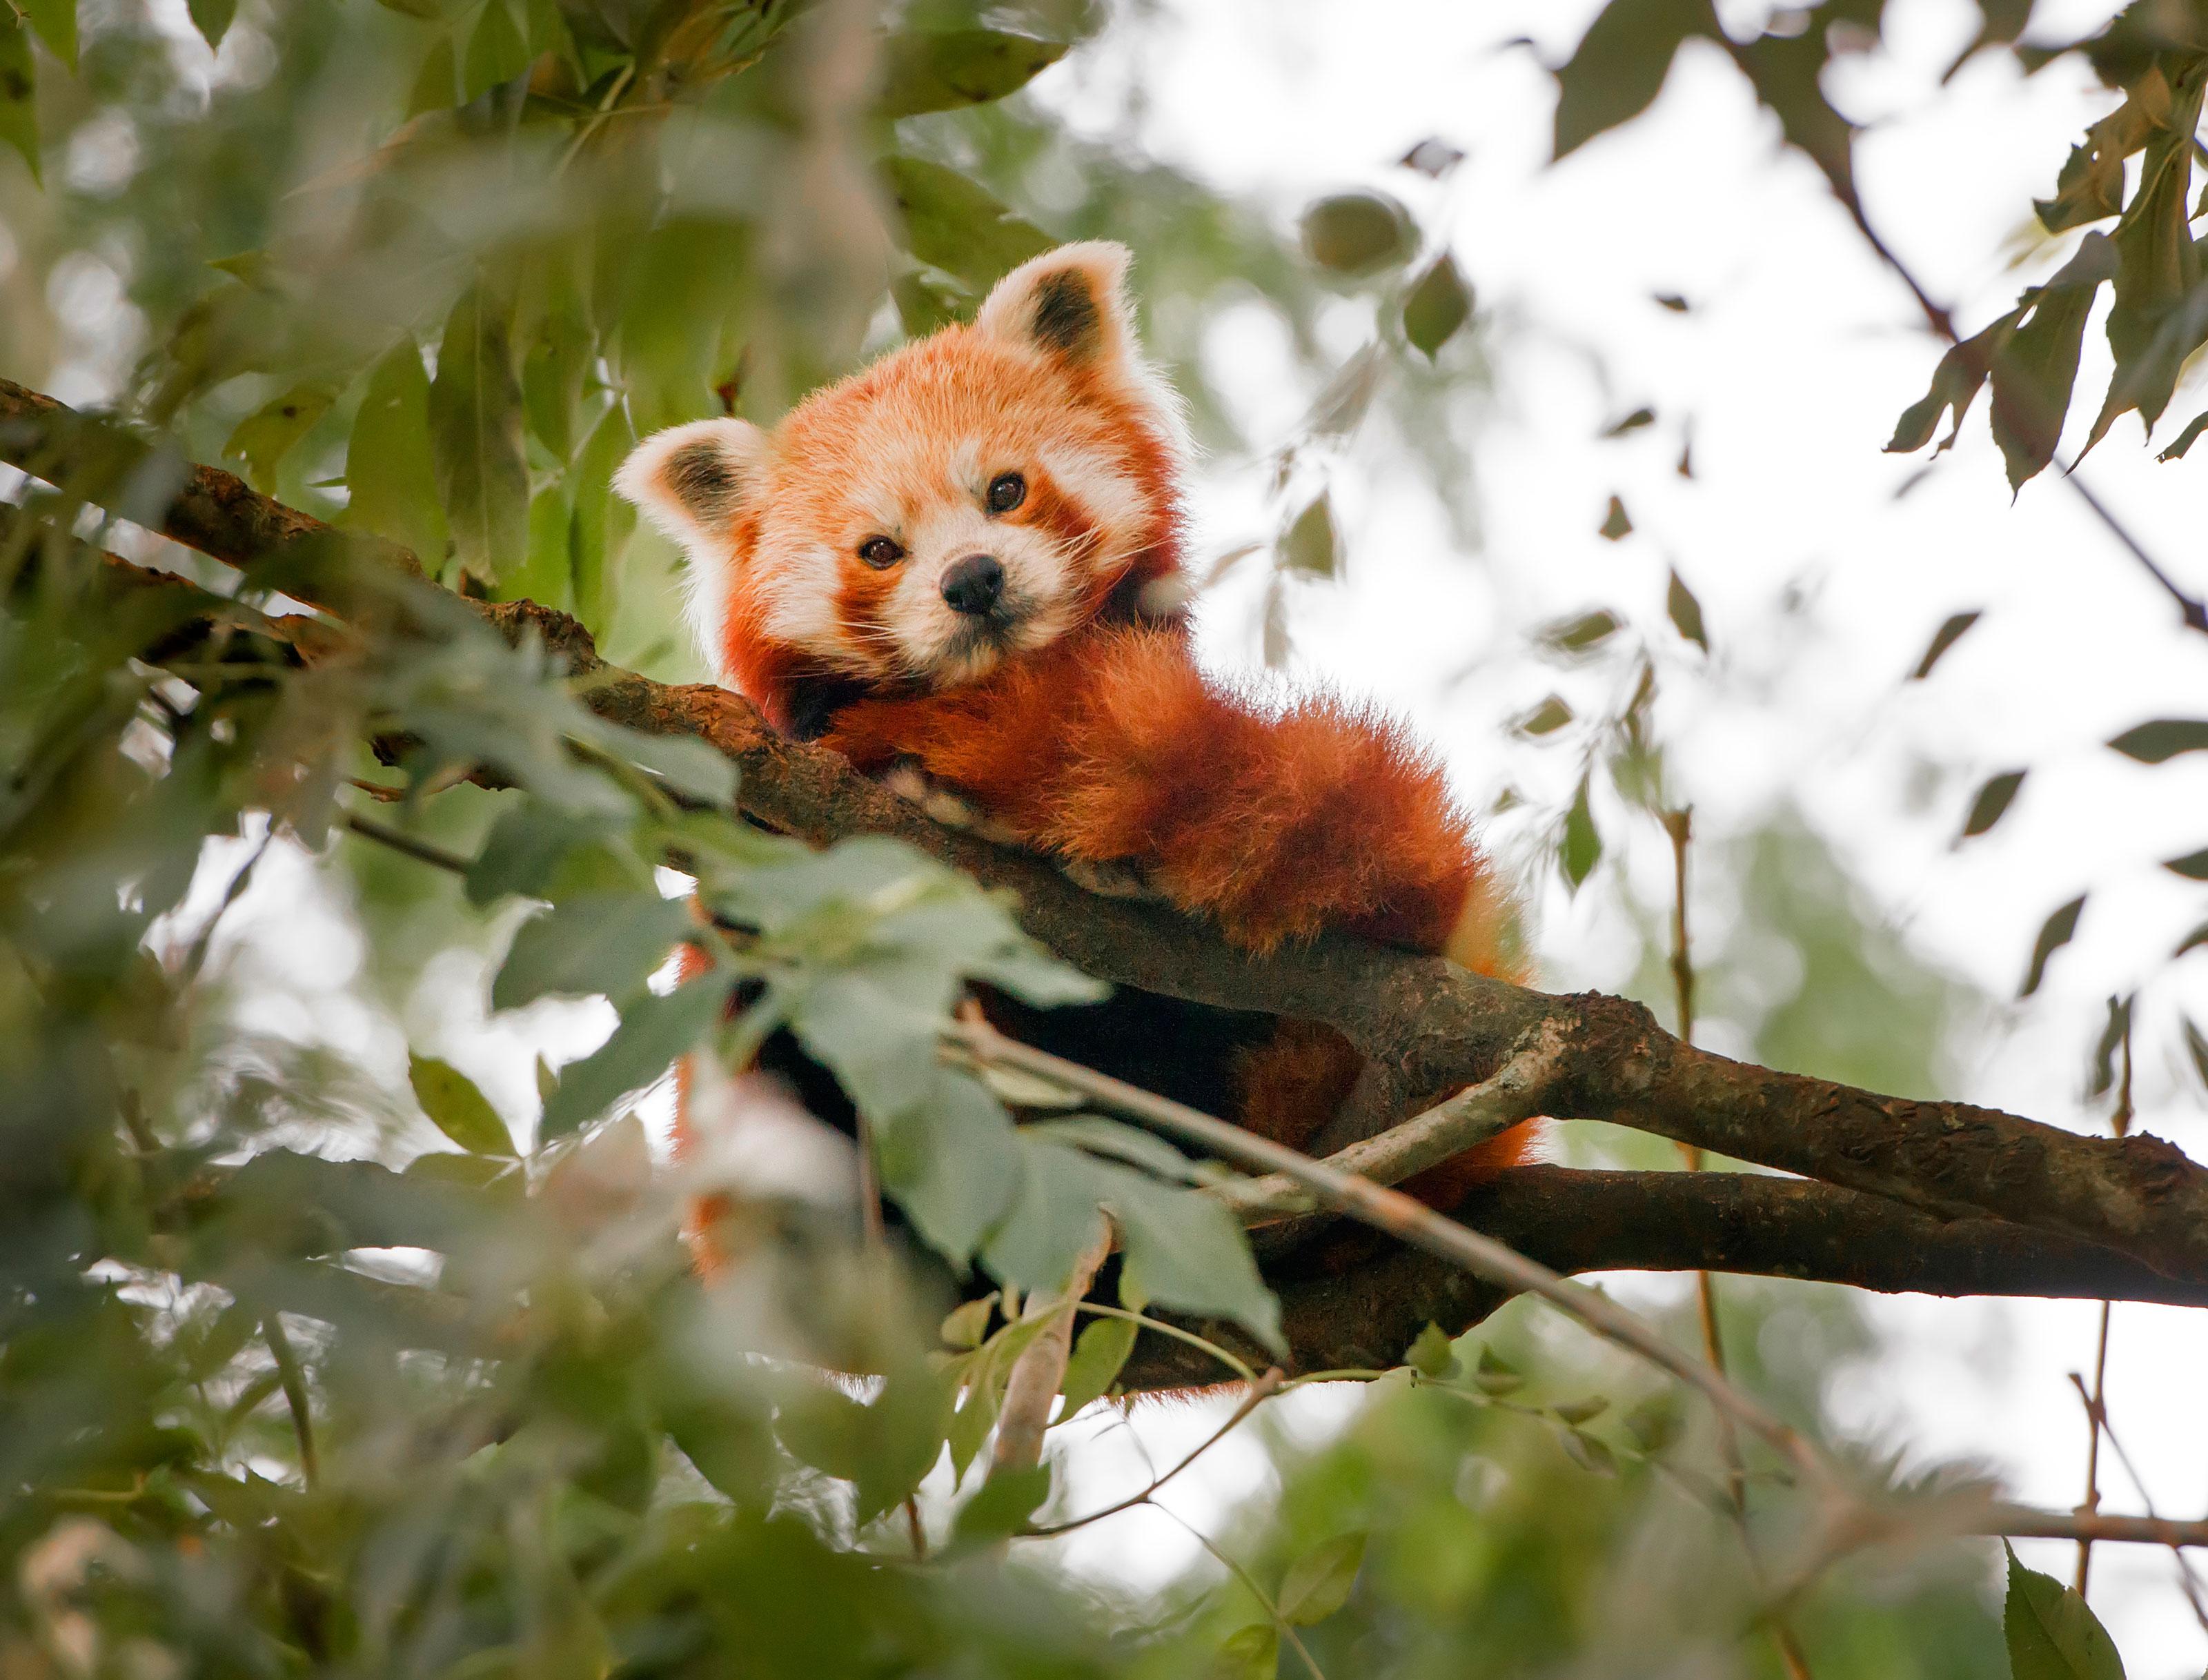 nøgne amatører odense zoo rabat